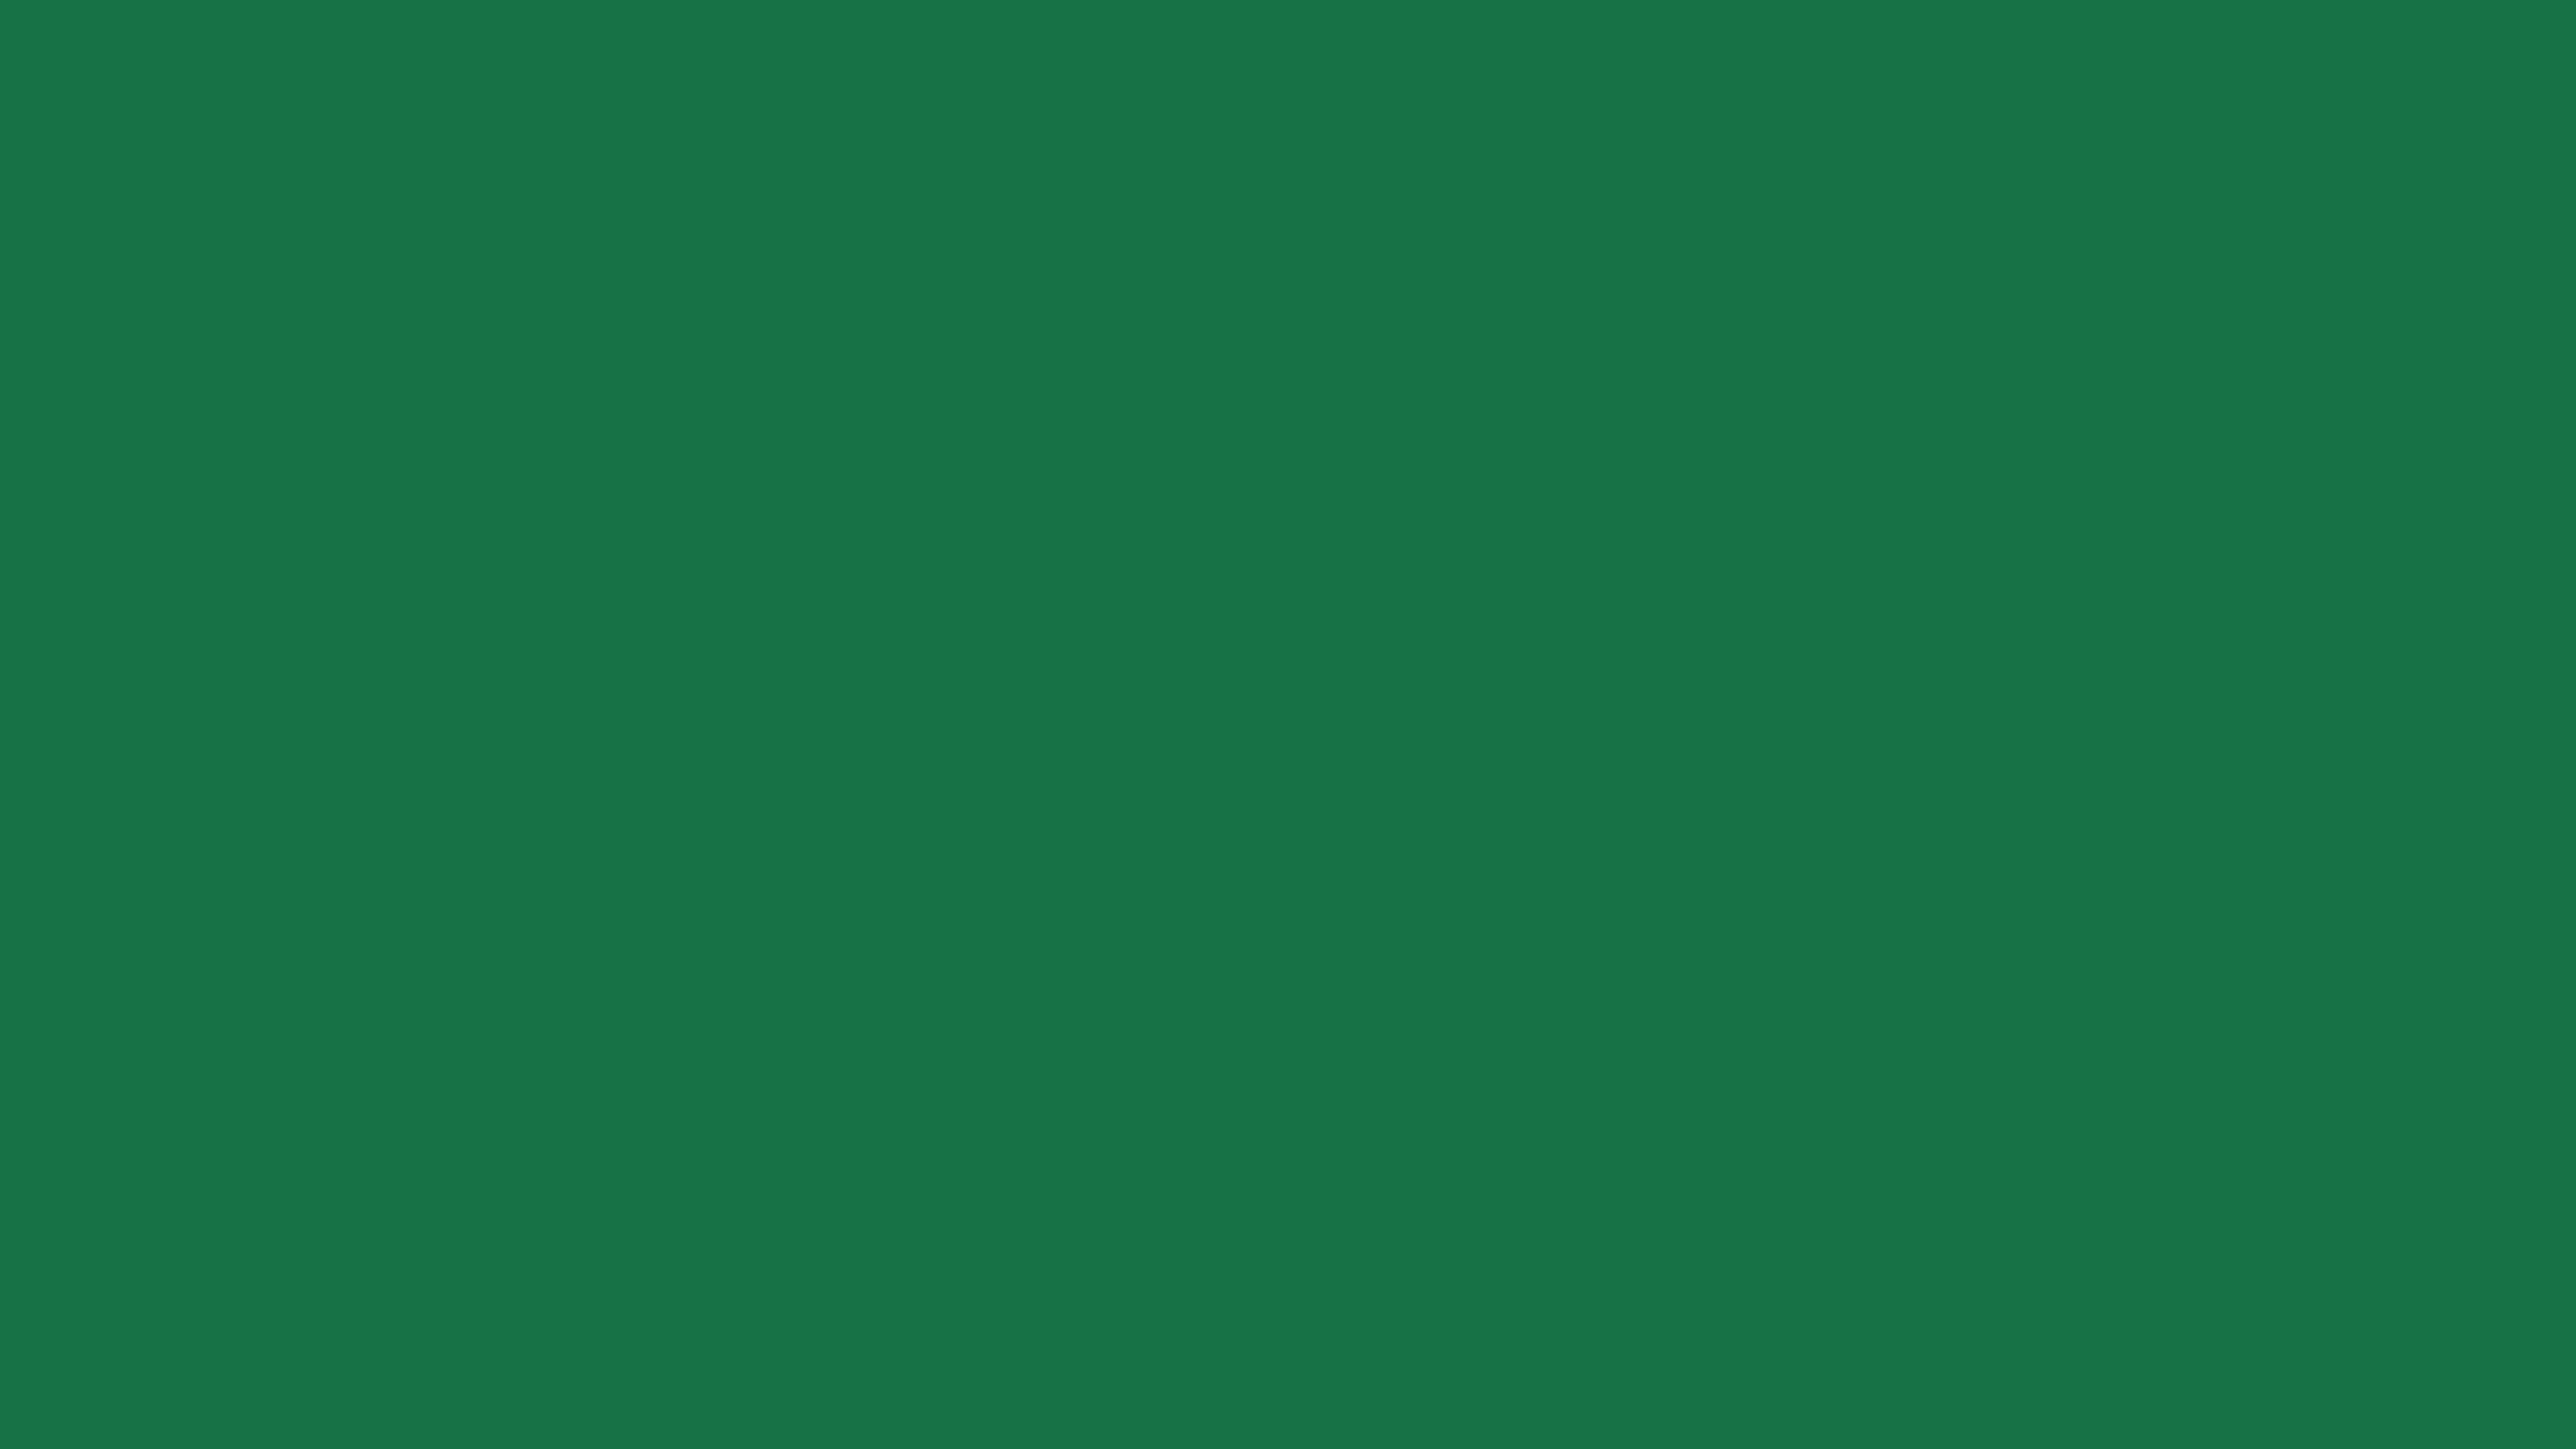 5120x2880 Dark Spring Green Solid Color Background